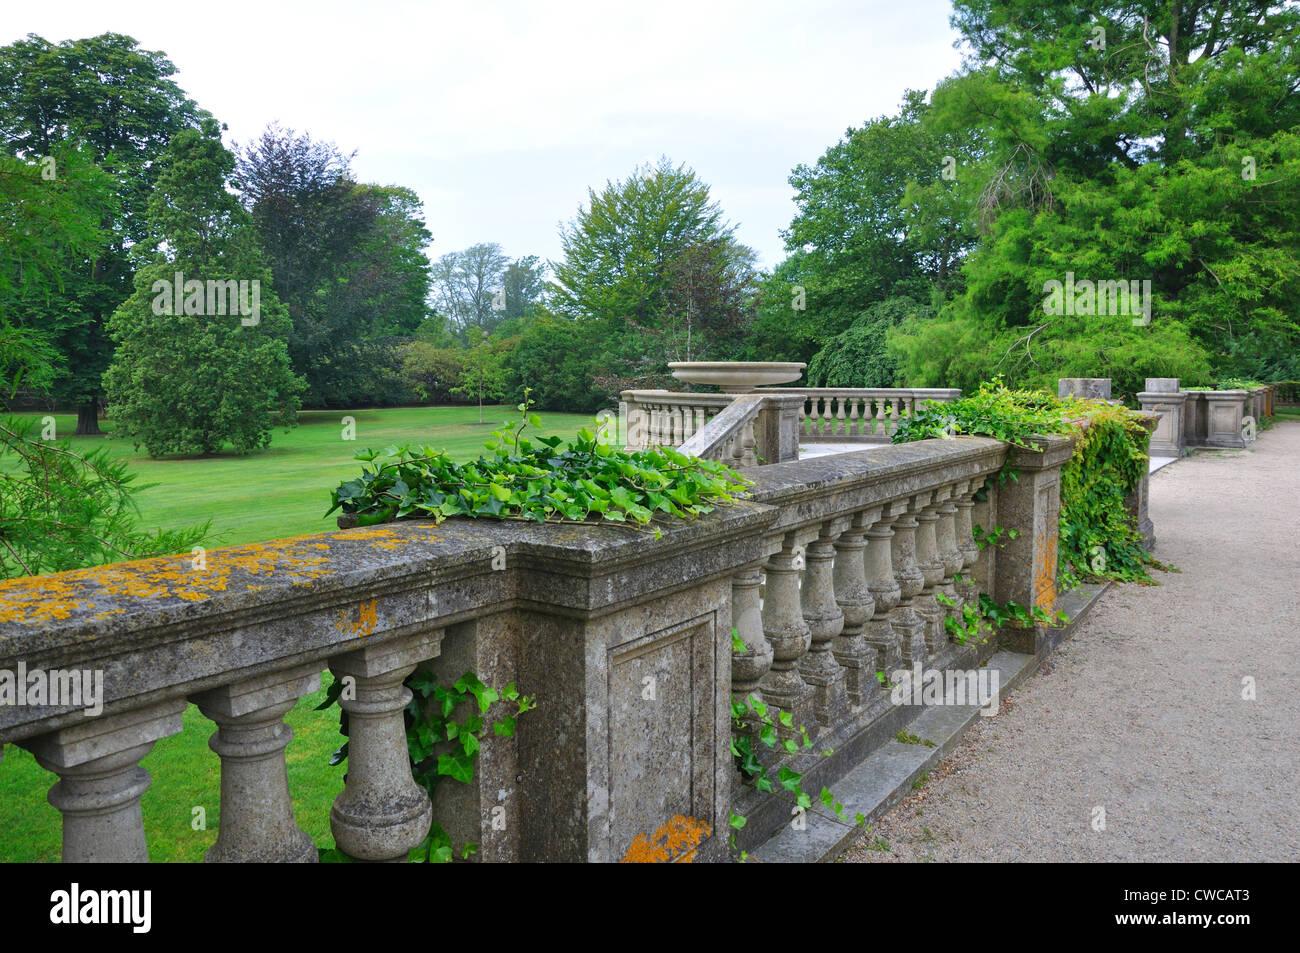 The Breakers Mansion Garden, Newport, Rhode Island, USA